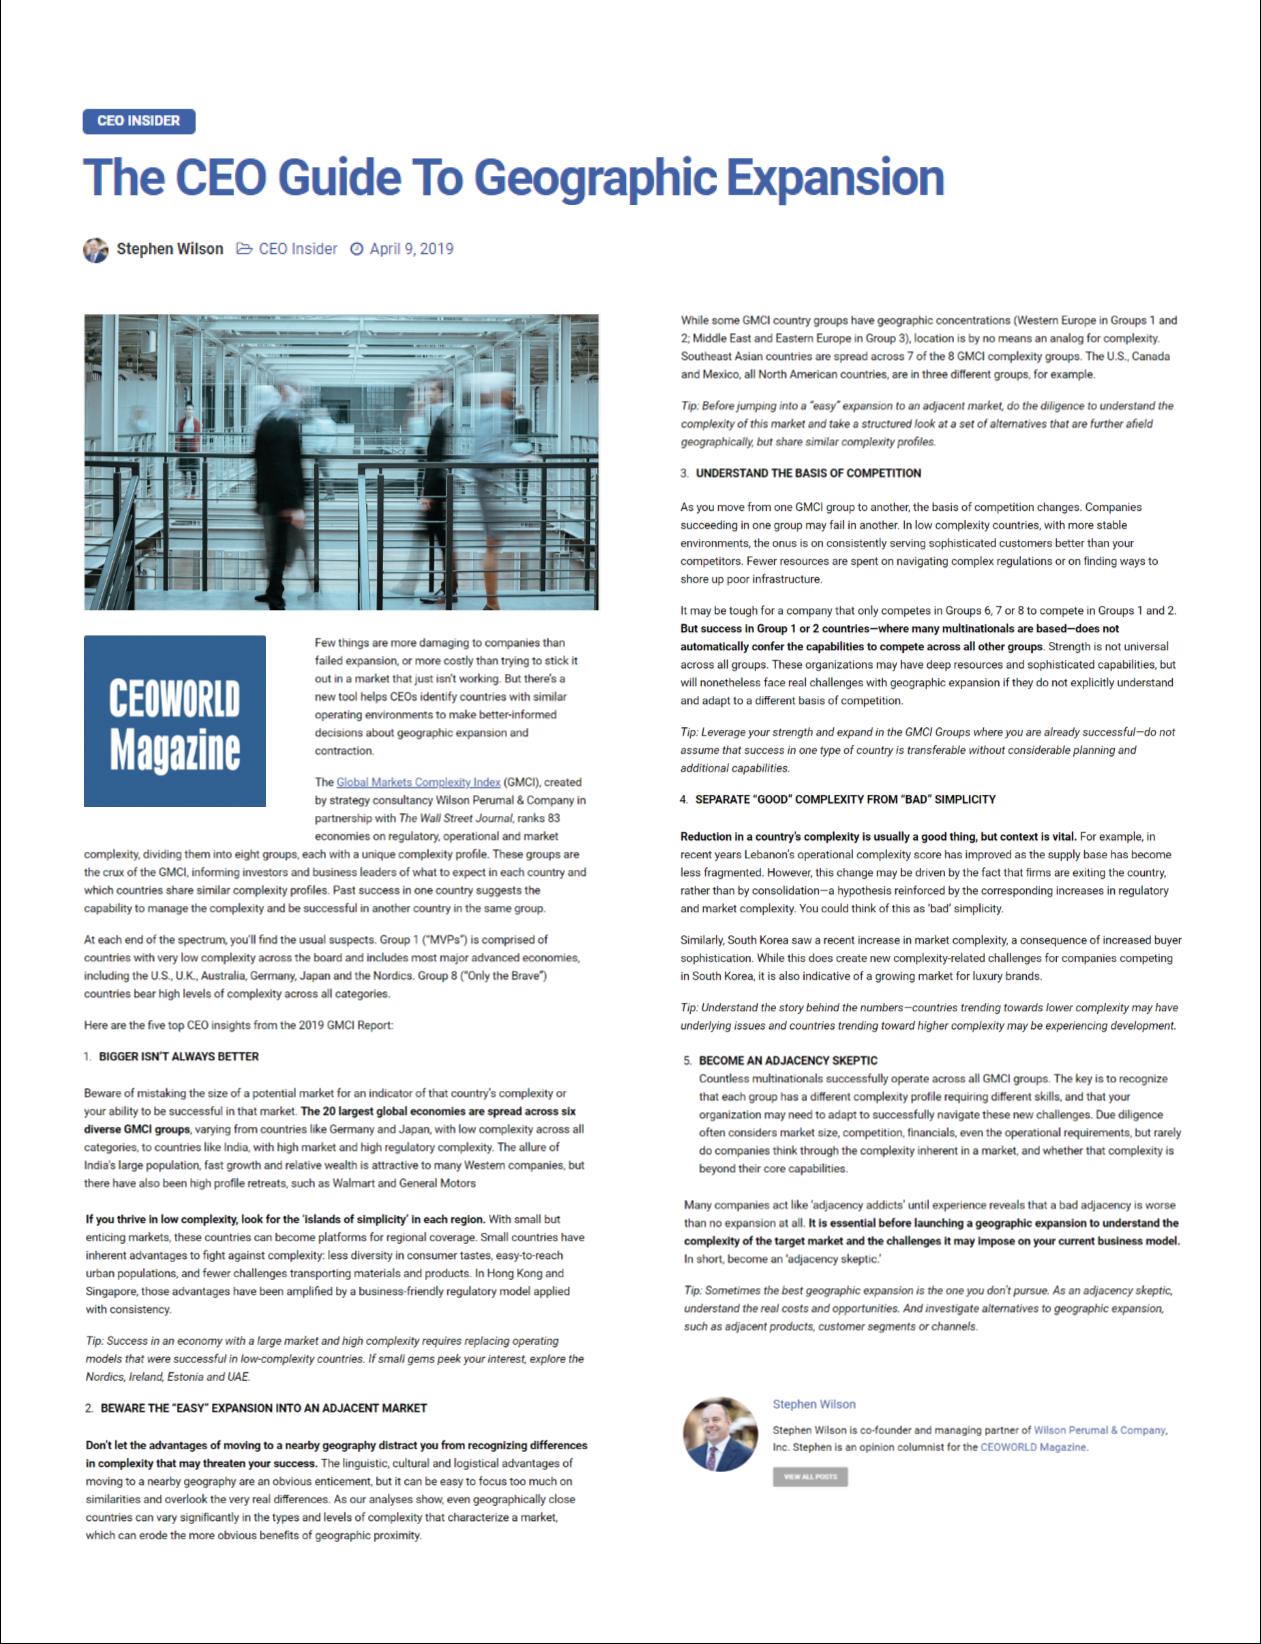 CEOWORLD Magazine GMCI